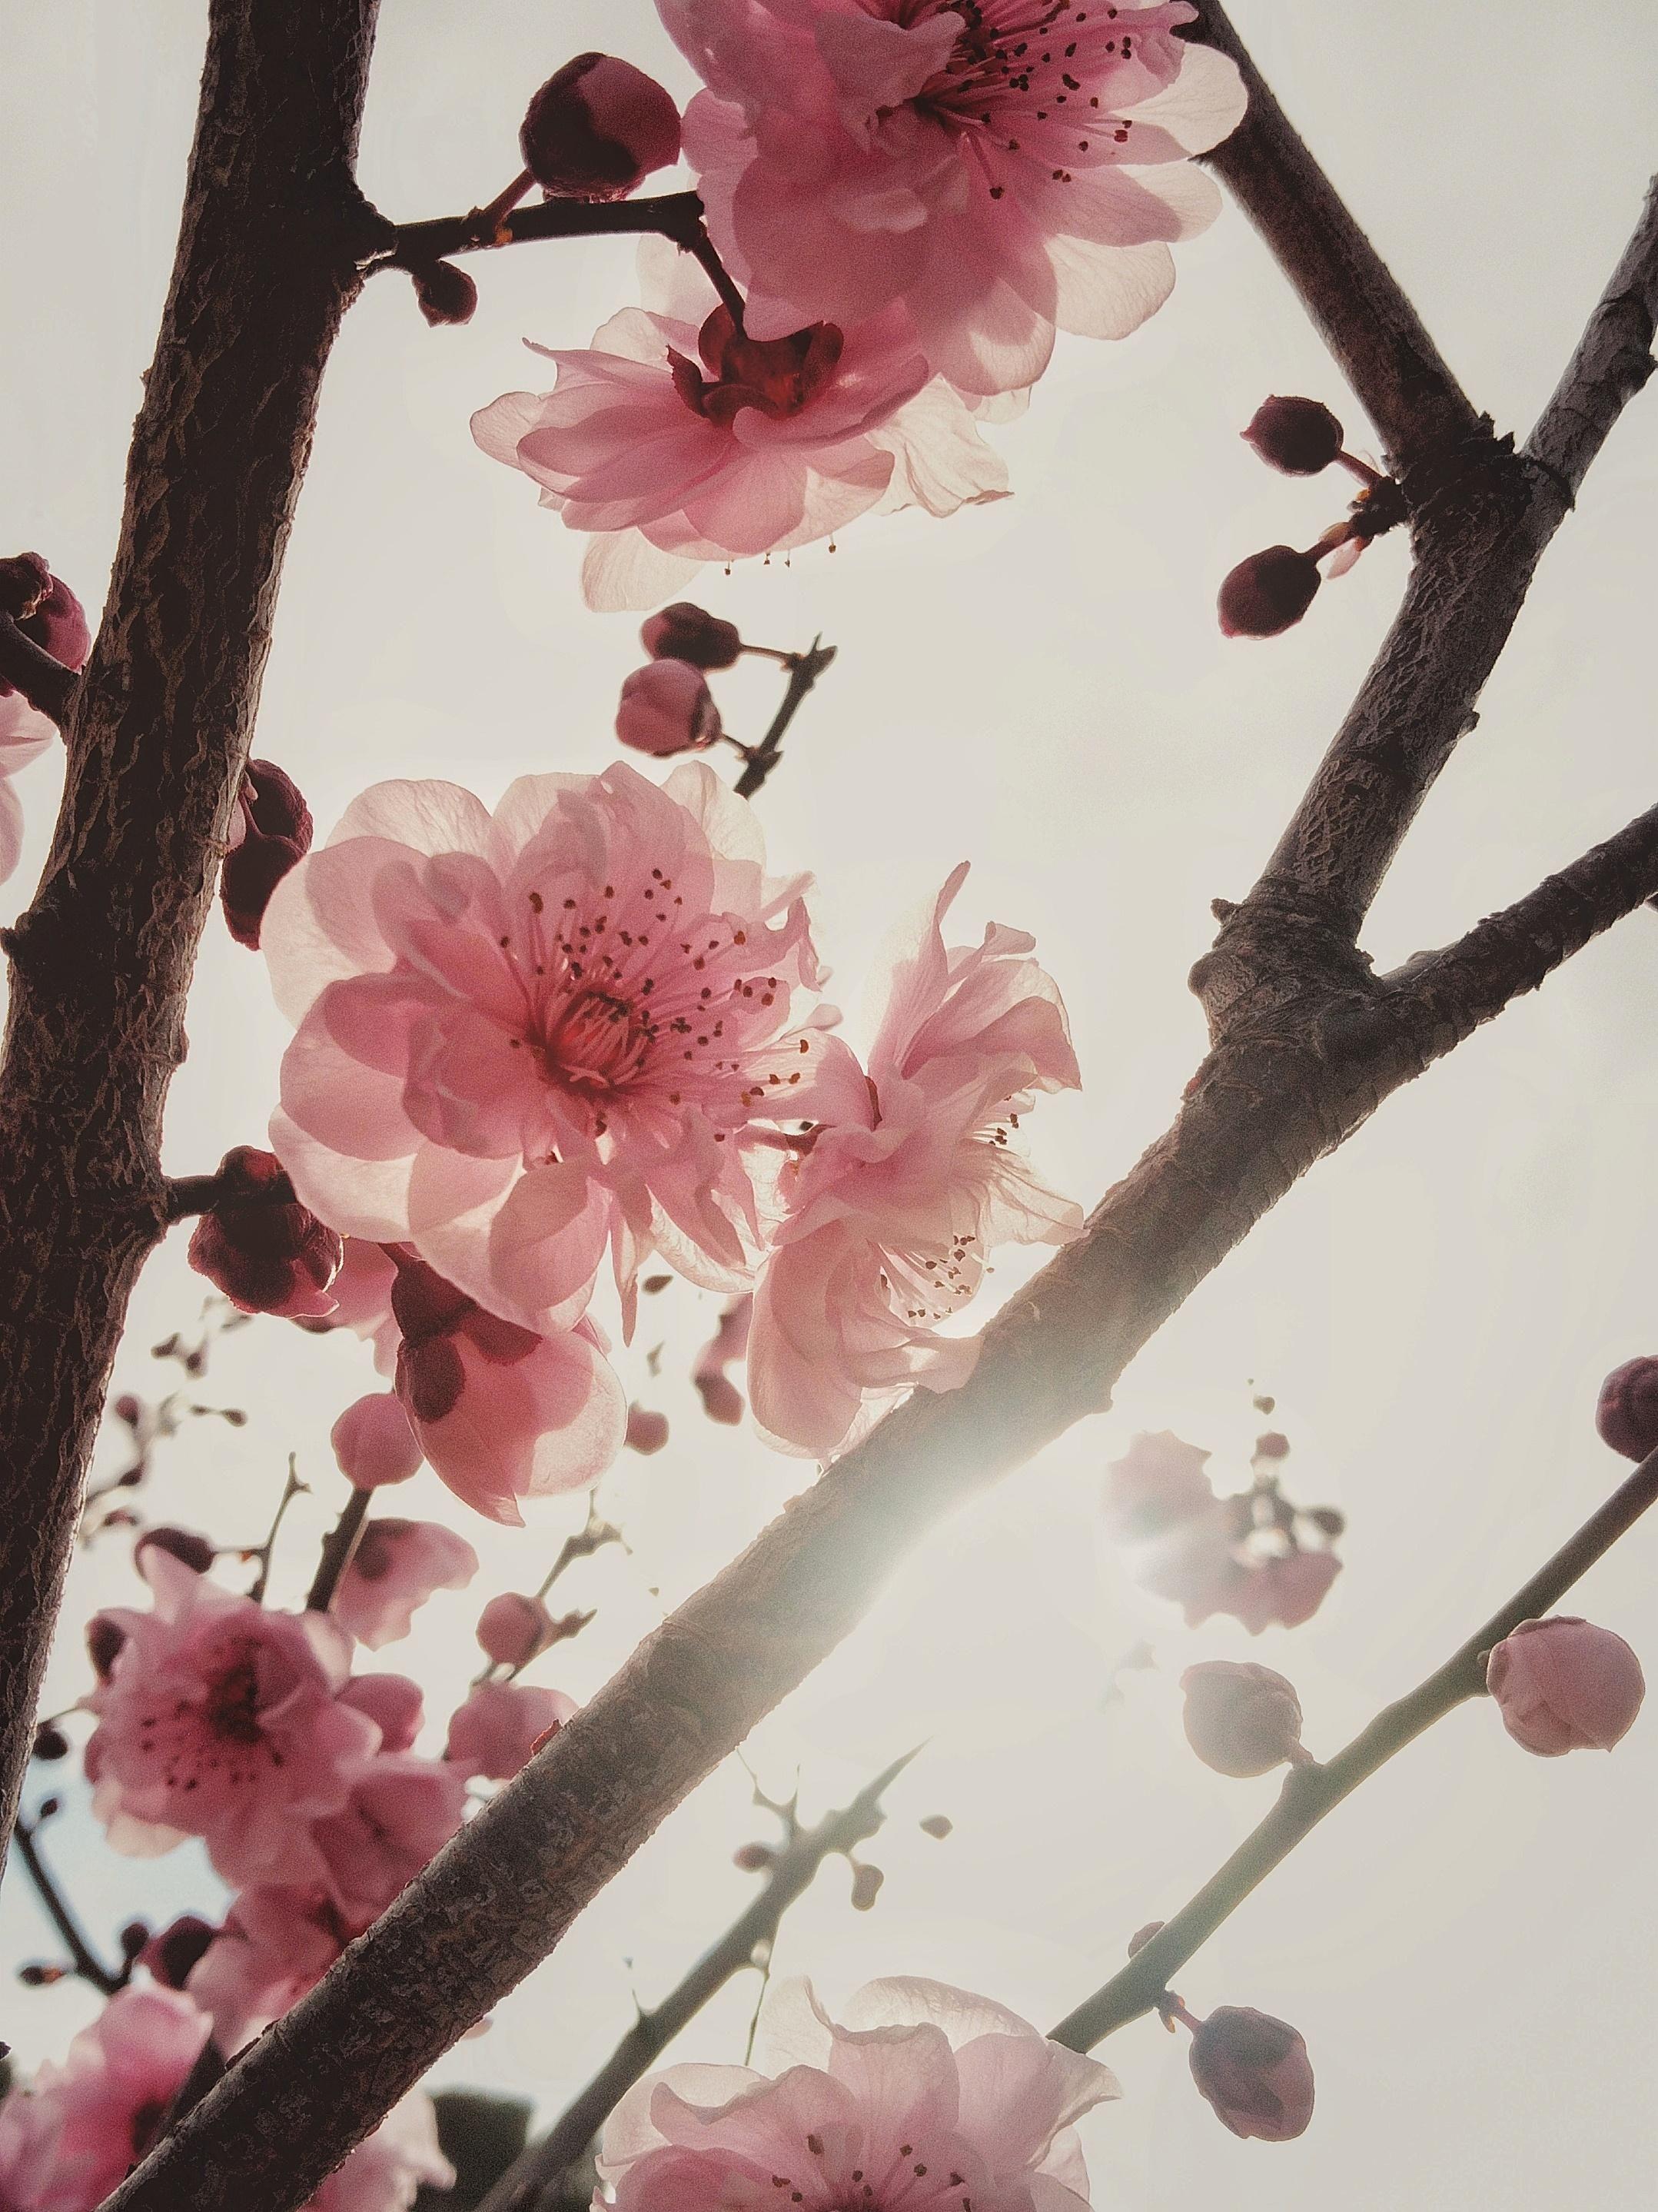 Cherry Blossom In Melbourne Australia 1080x1350 Oc Https Ift Tt 2mncspr Melbourne Australia Cherry Blossom Blossom